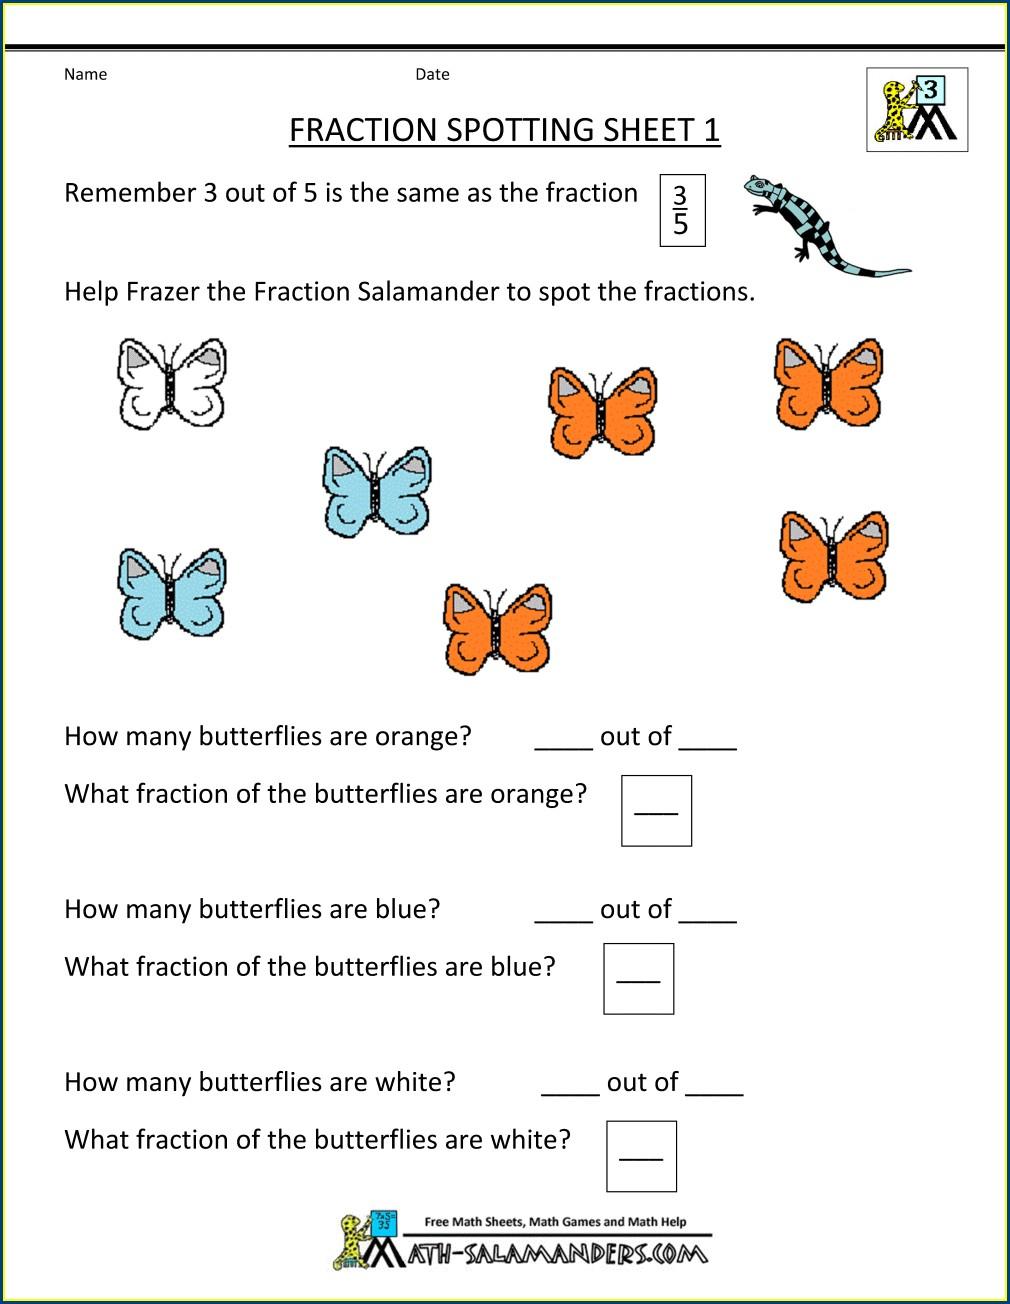 Finding Fractions Of A Set Worksheet